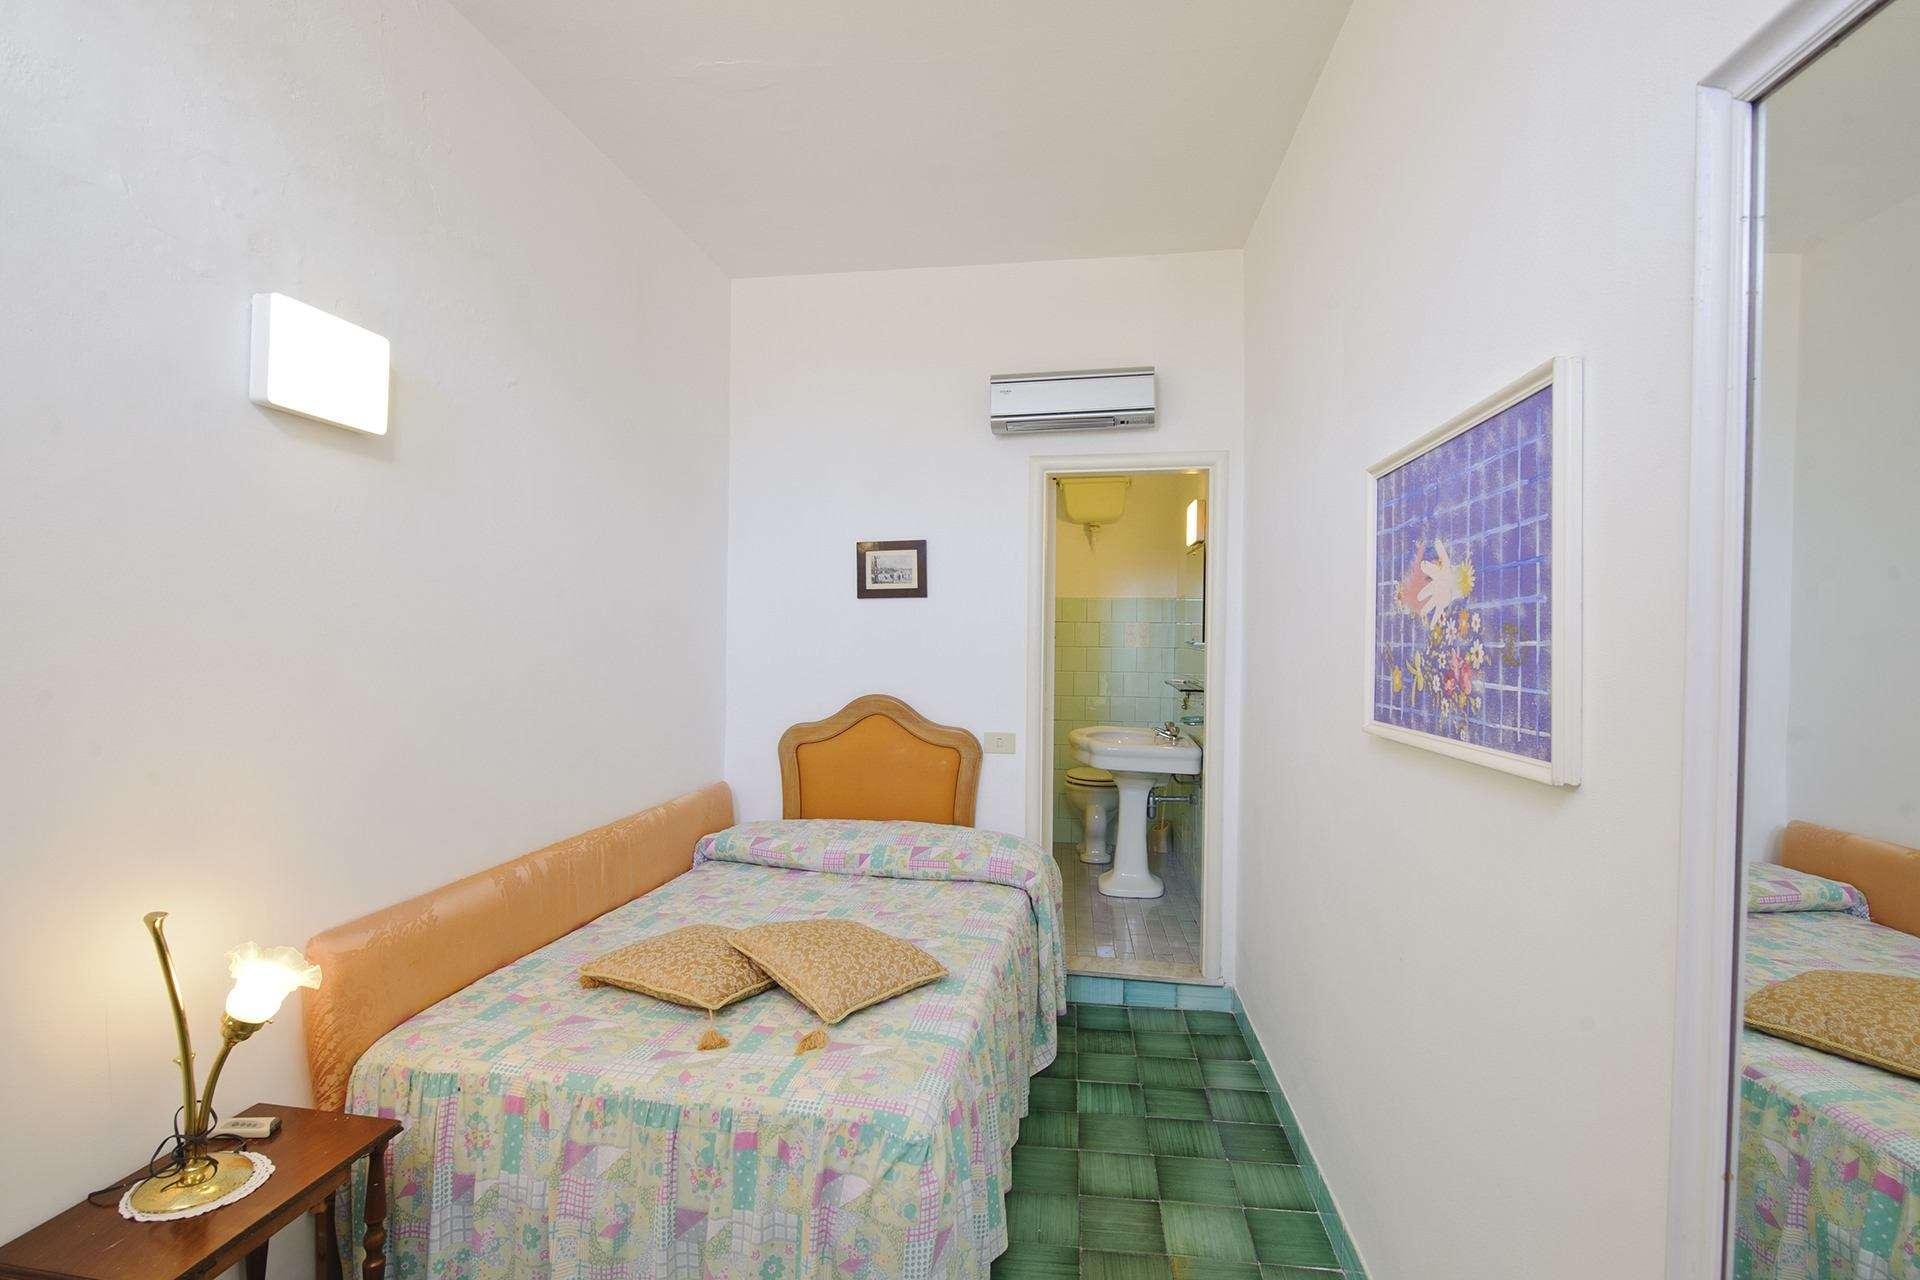 22 ninfe bedroom